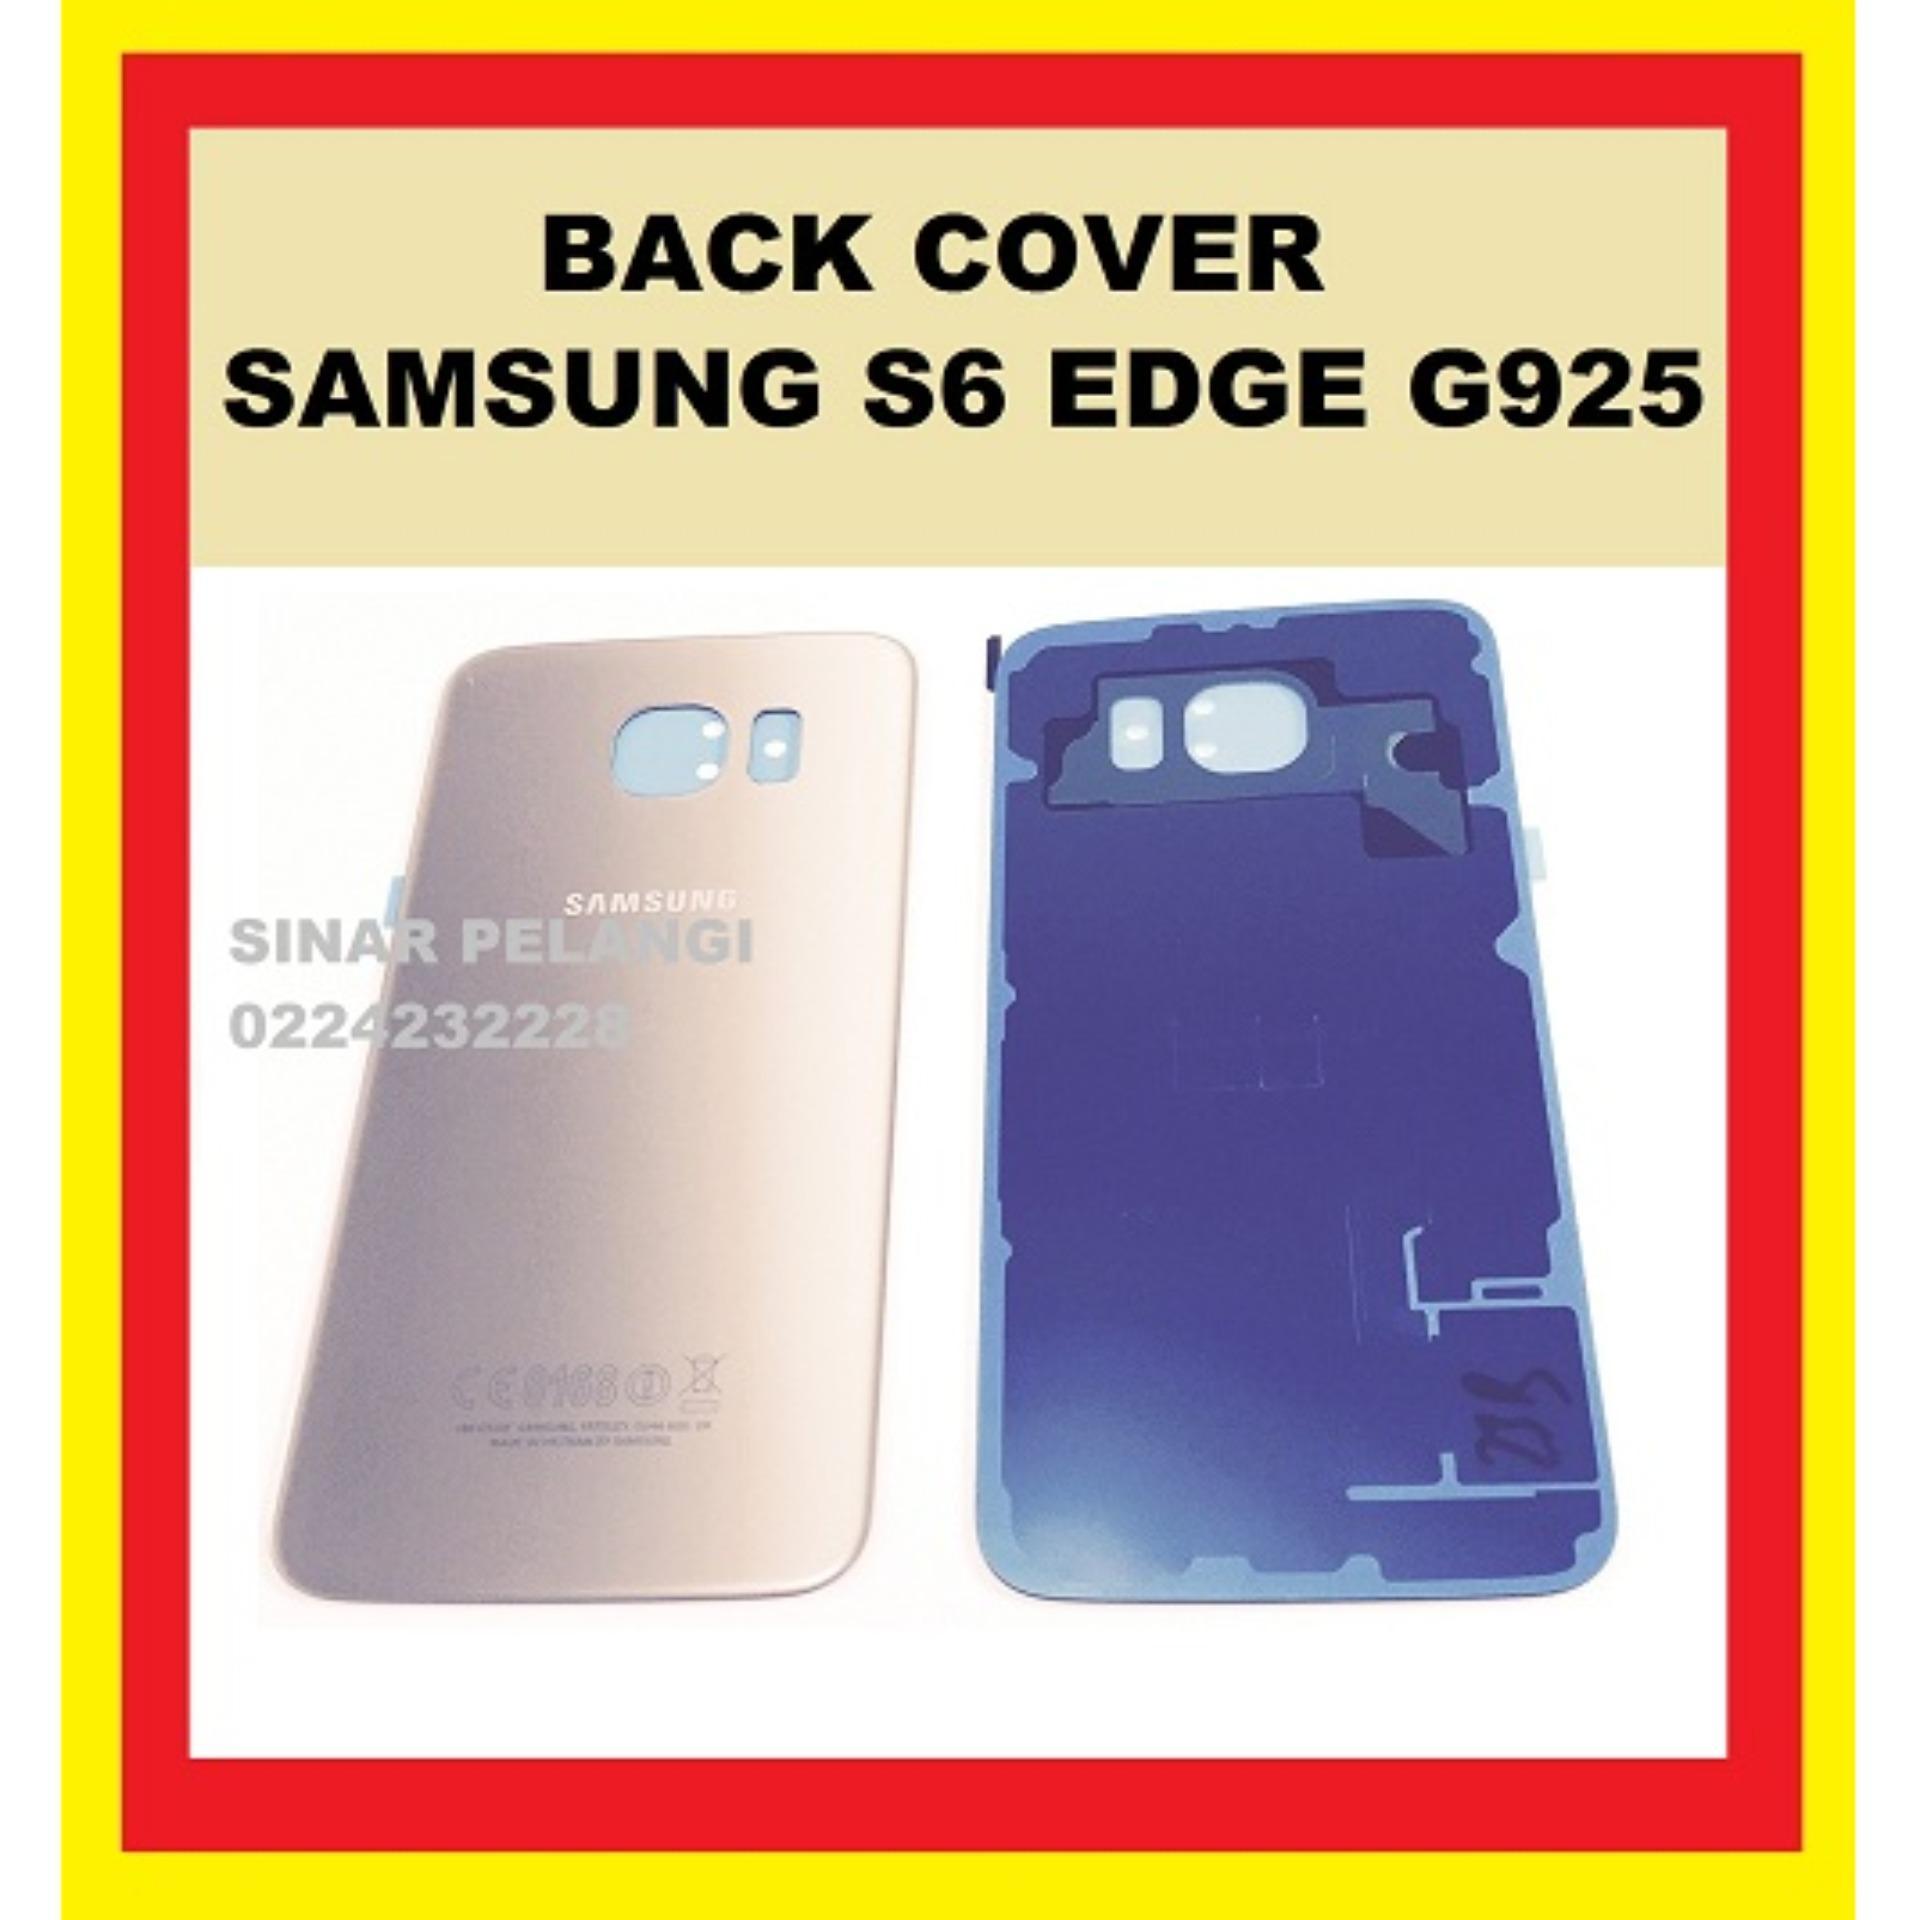 SAMSUNG GALAXY S6 EDGE G925 GOLD ORIGINAL BACK COVER BATTERY COVER TUTUP BATERAI PENUTUP BELAKANG 907436